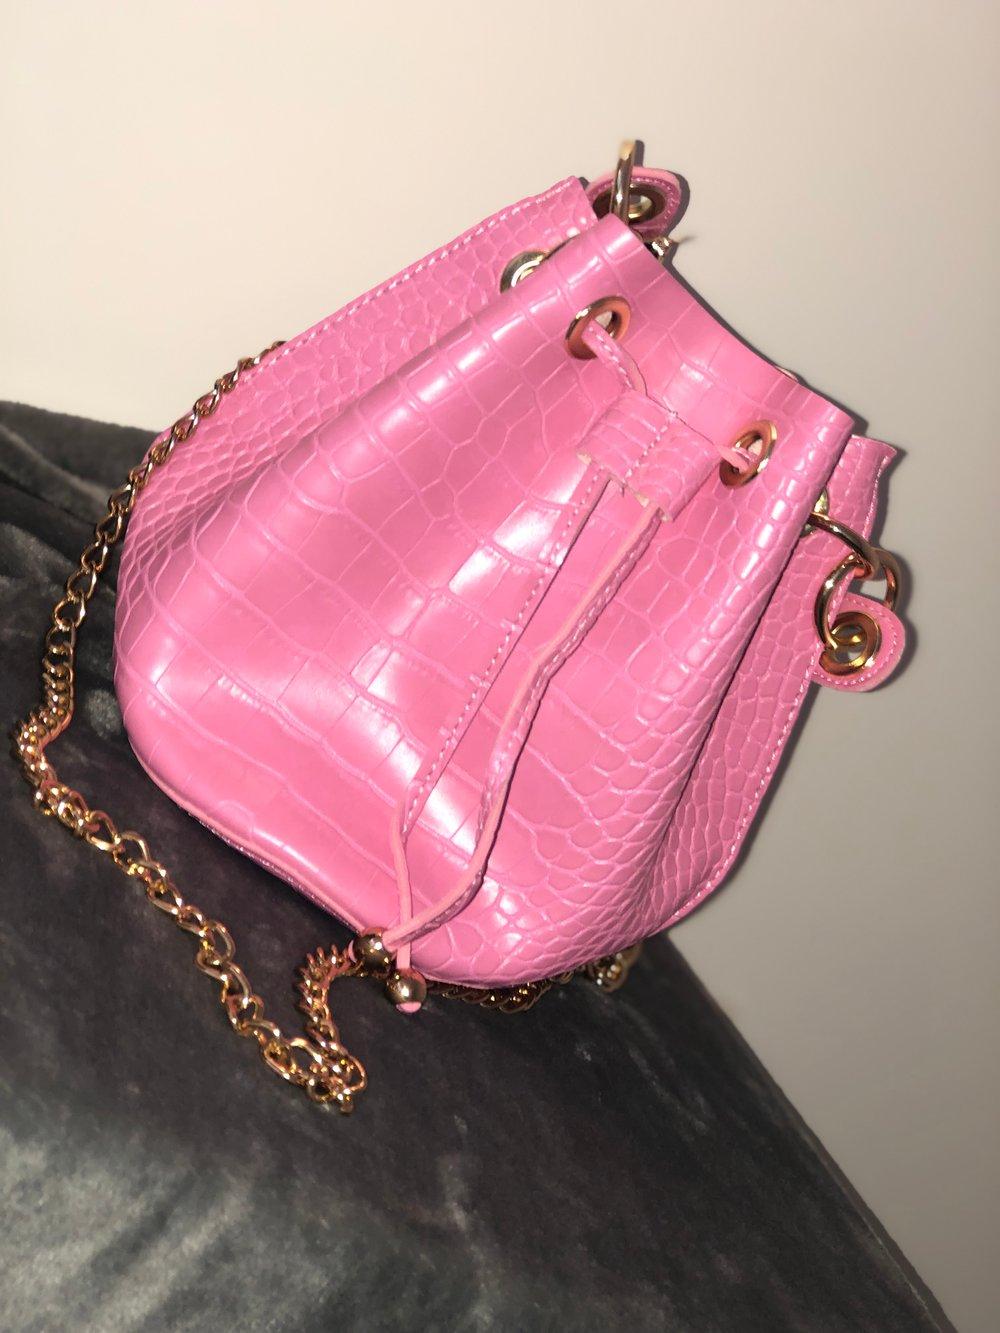 Image of Croc Bucket Bag